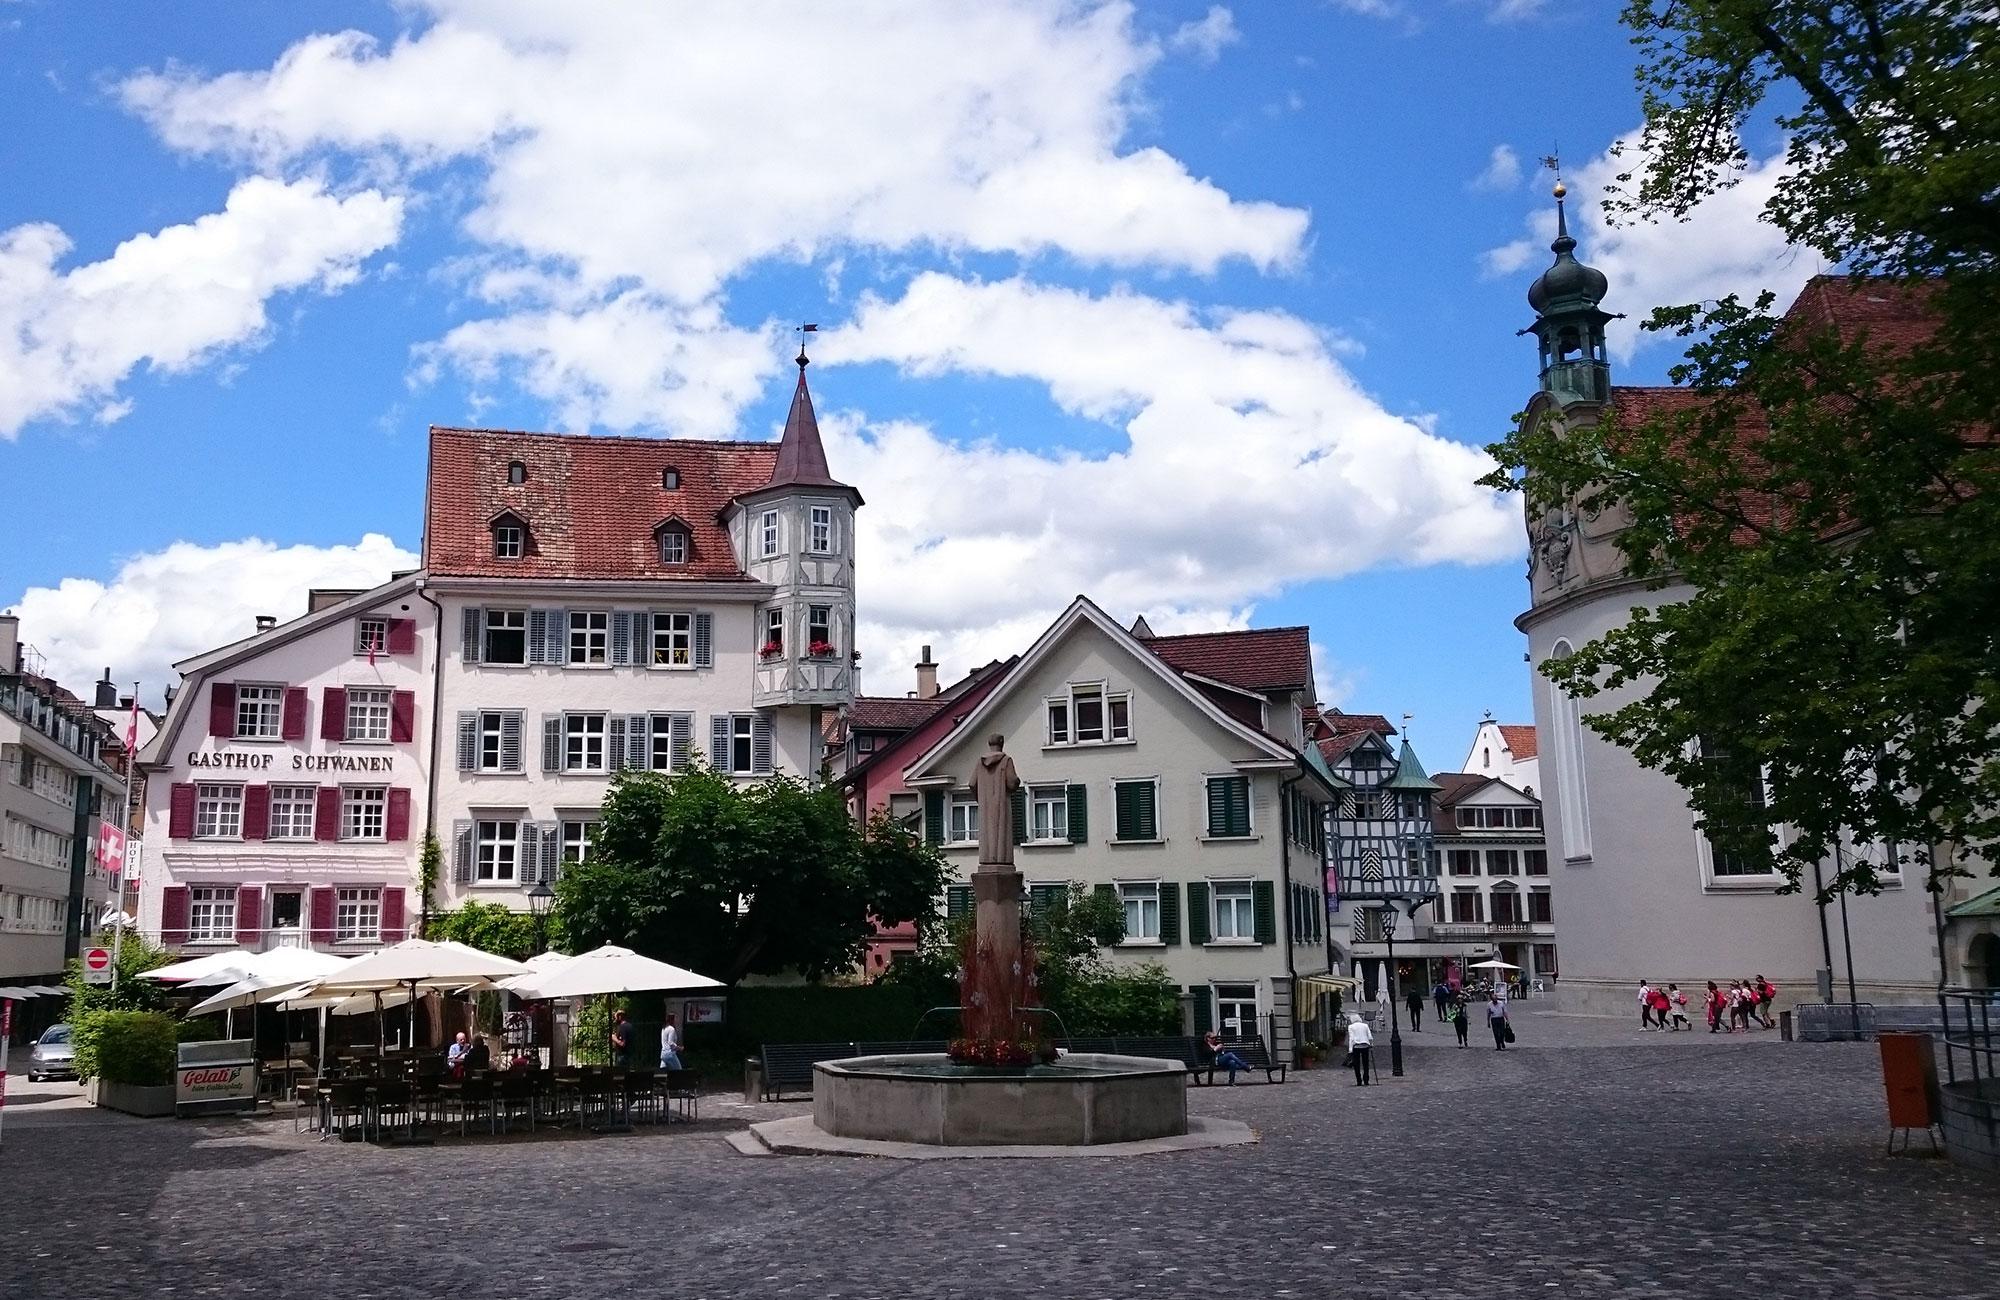 Voyage MICE Suisse - St Gallen Switzerland Meeting Trophy - Amplitudes